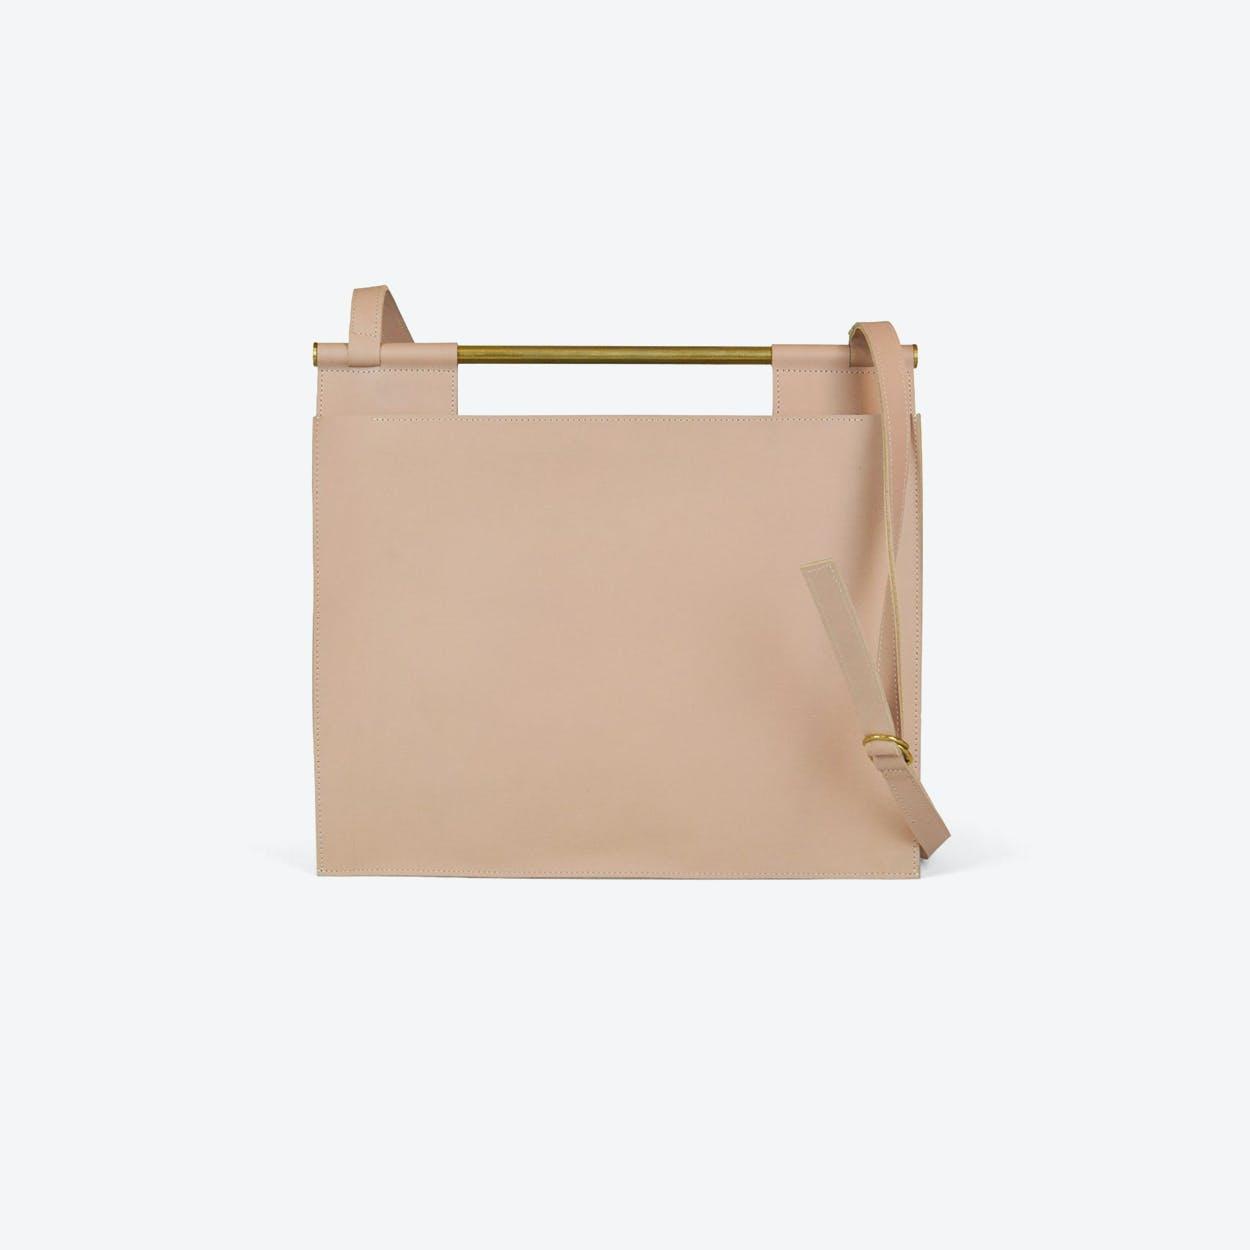 Workbag Frame - Nude